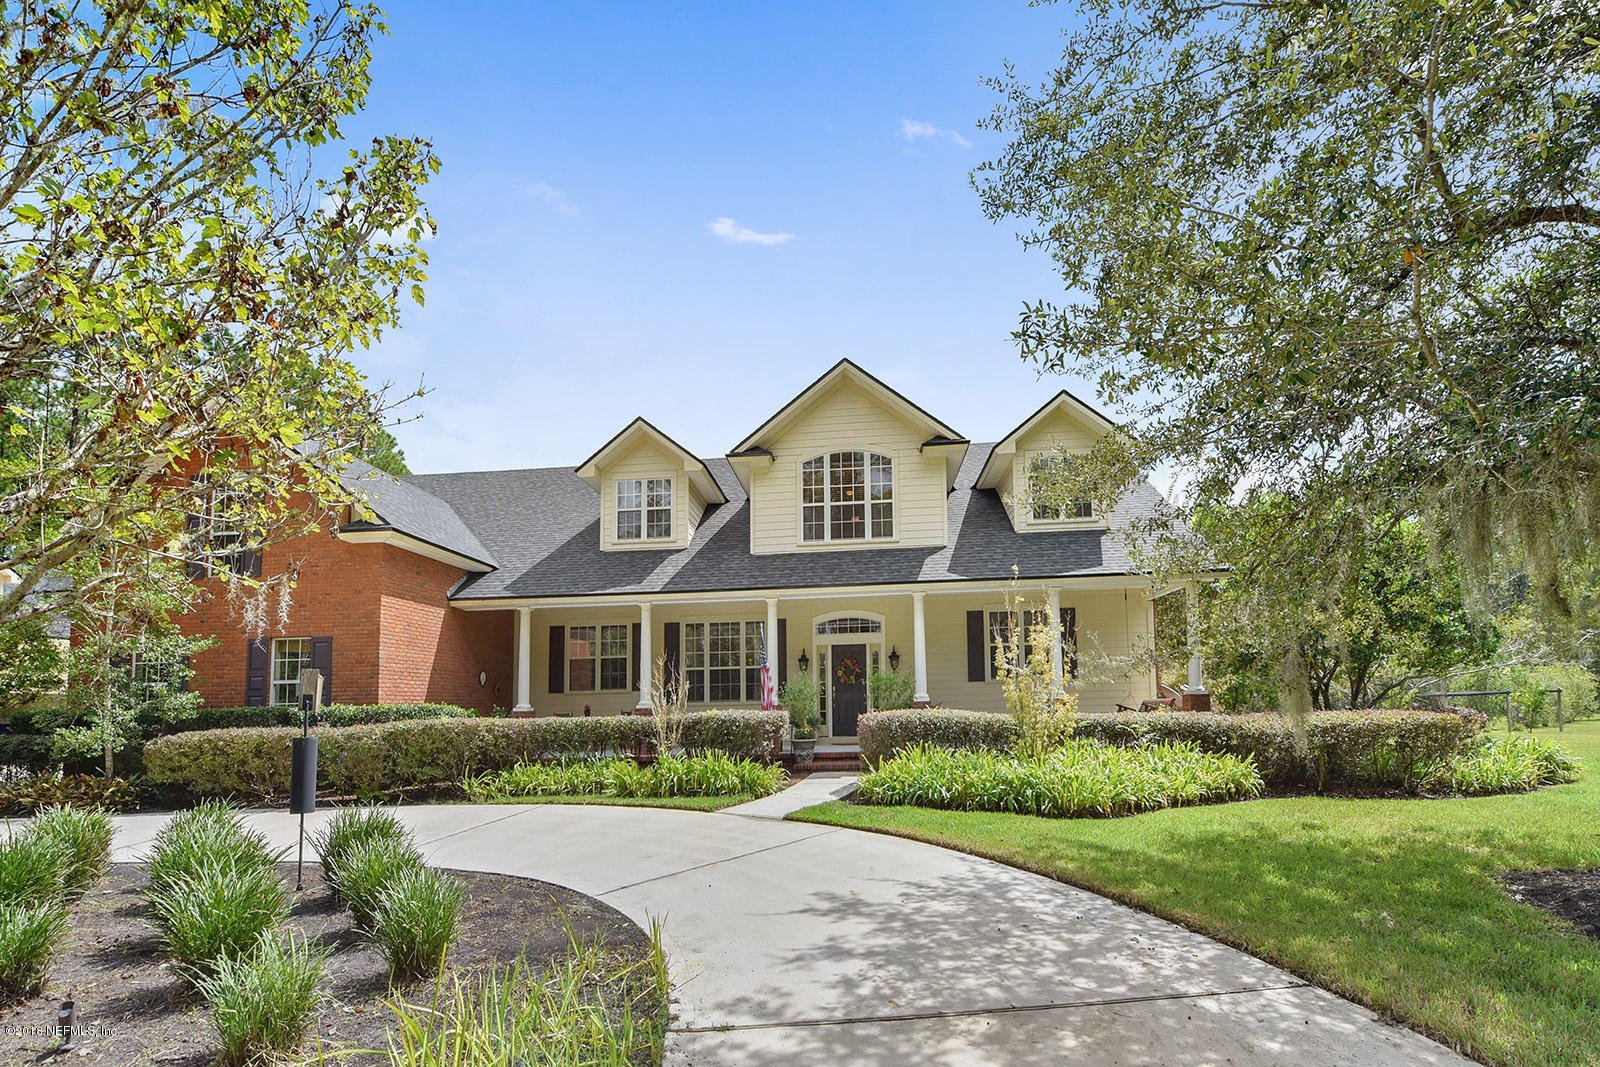 418 TRIPLE CROWN, ST JOHNS, FLORIDA 32259, 4 Bedrooms Bedrooms, ,3 BathroomsBathrooms,Residential - single family,For sale,TRIPLE CROWN,959573